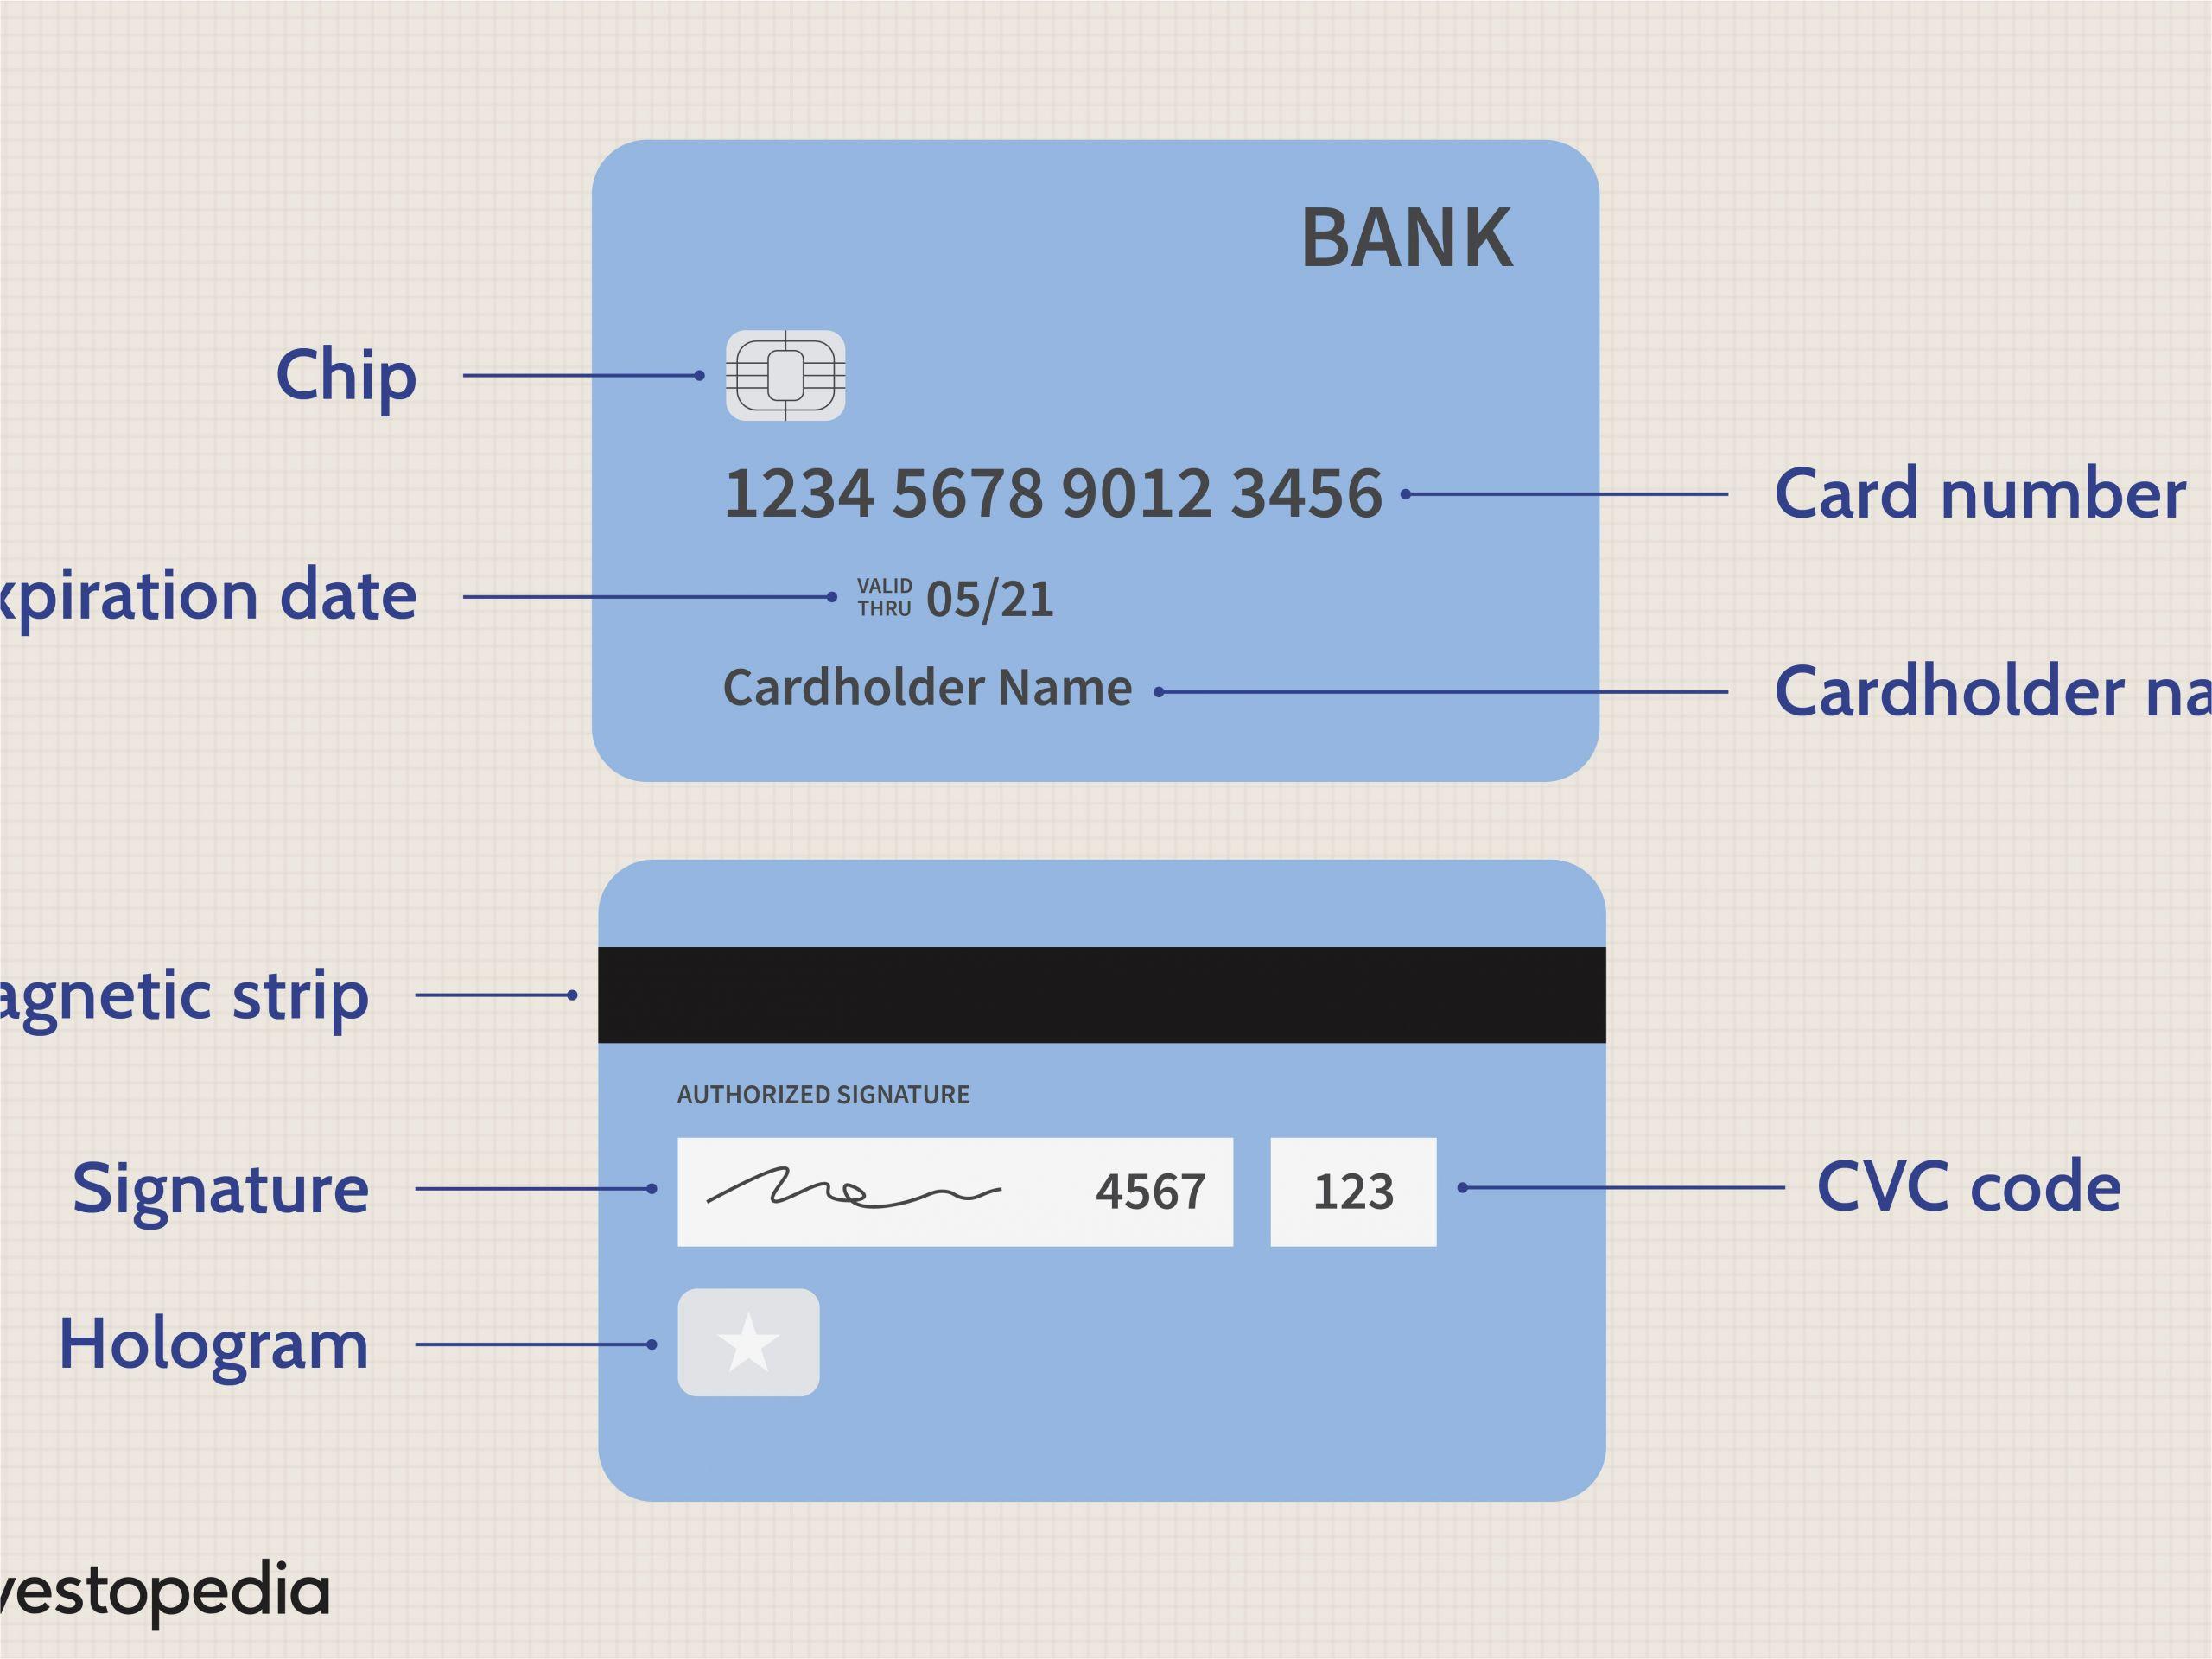 dotdash final what happens when your credit card expires may 2020 01 20f6cb63bda2417fbdf4487ff3e0386a jpg